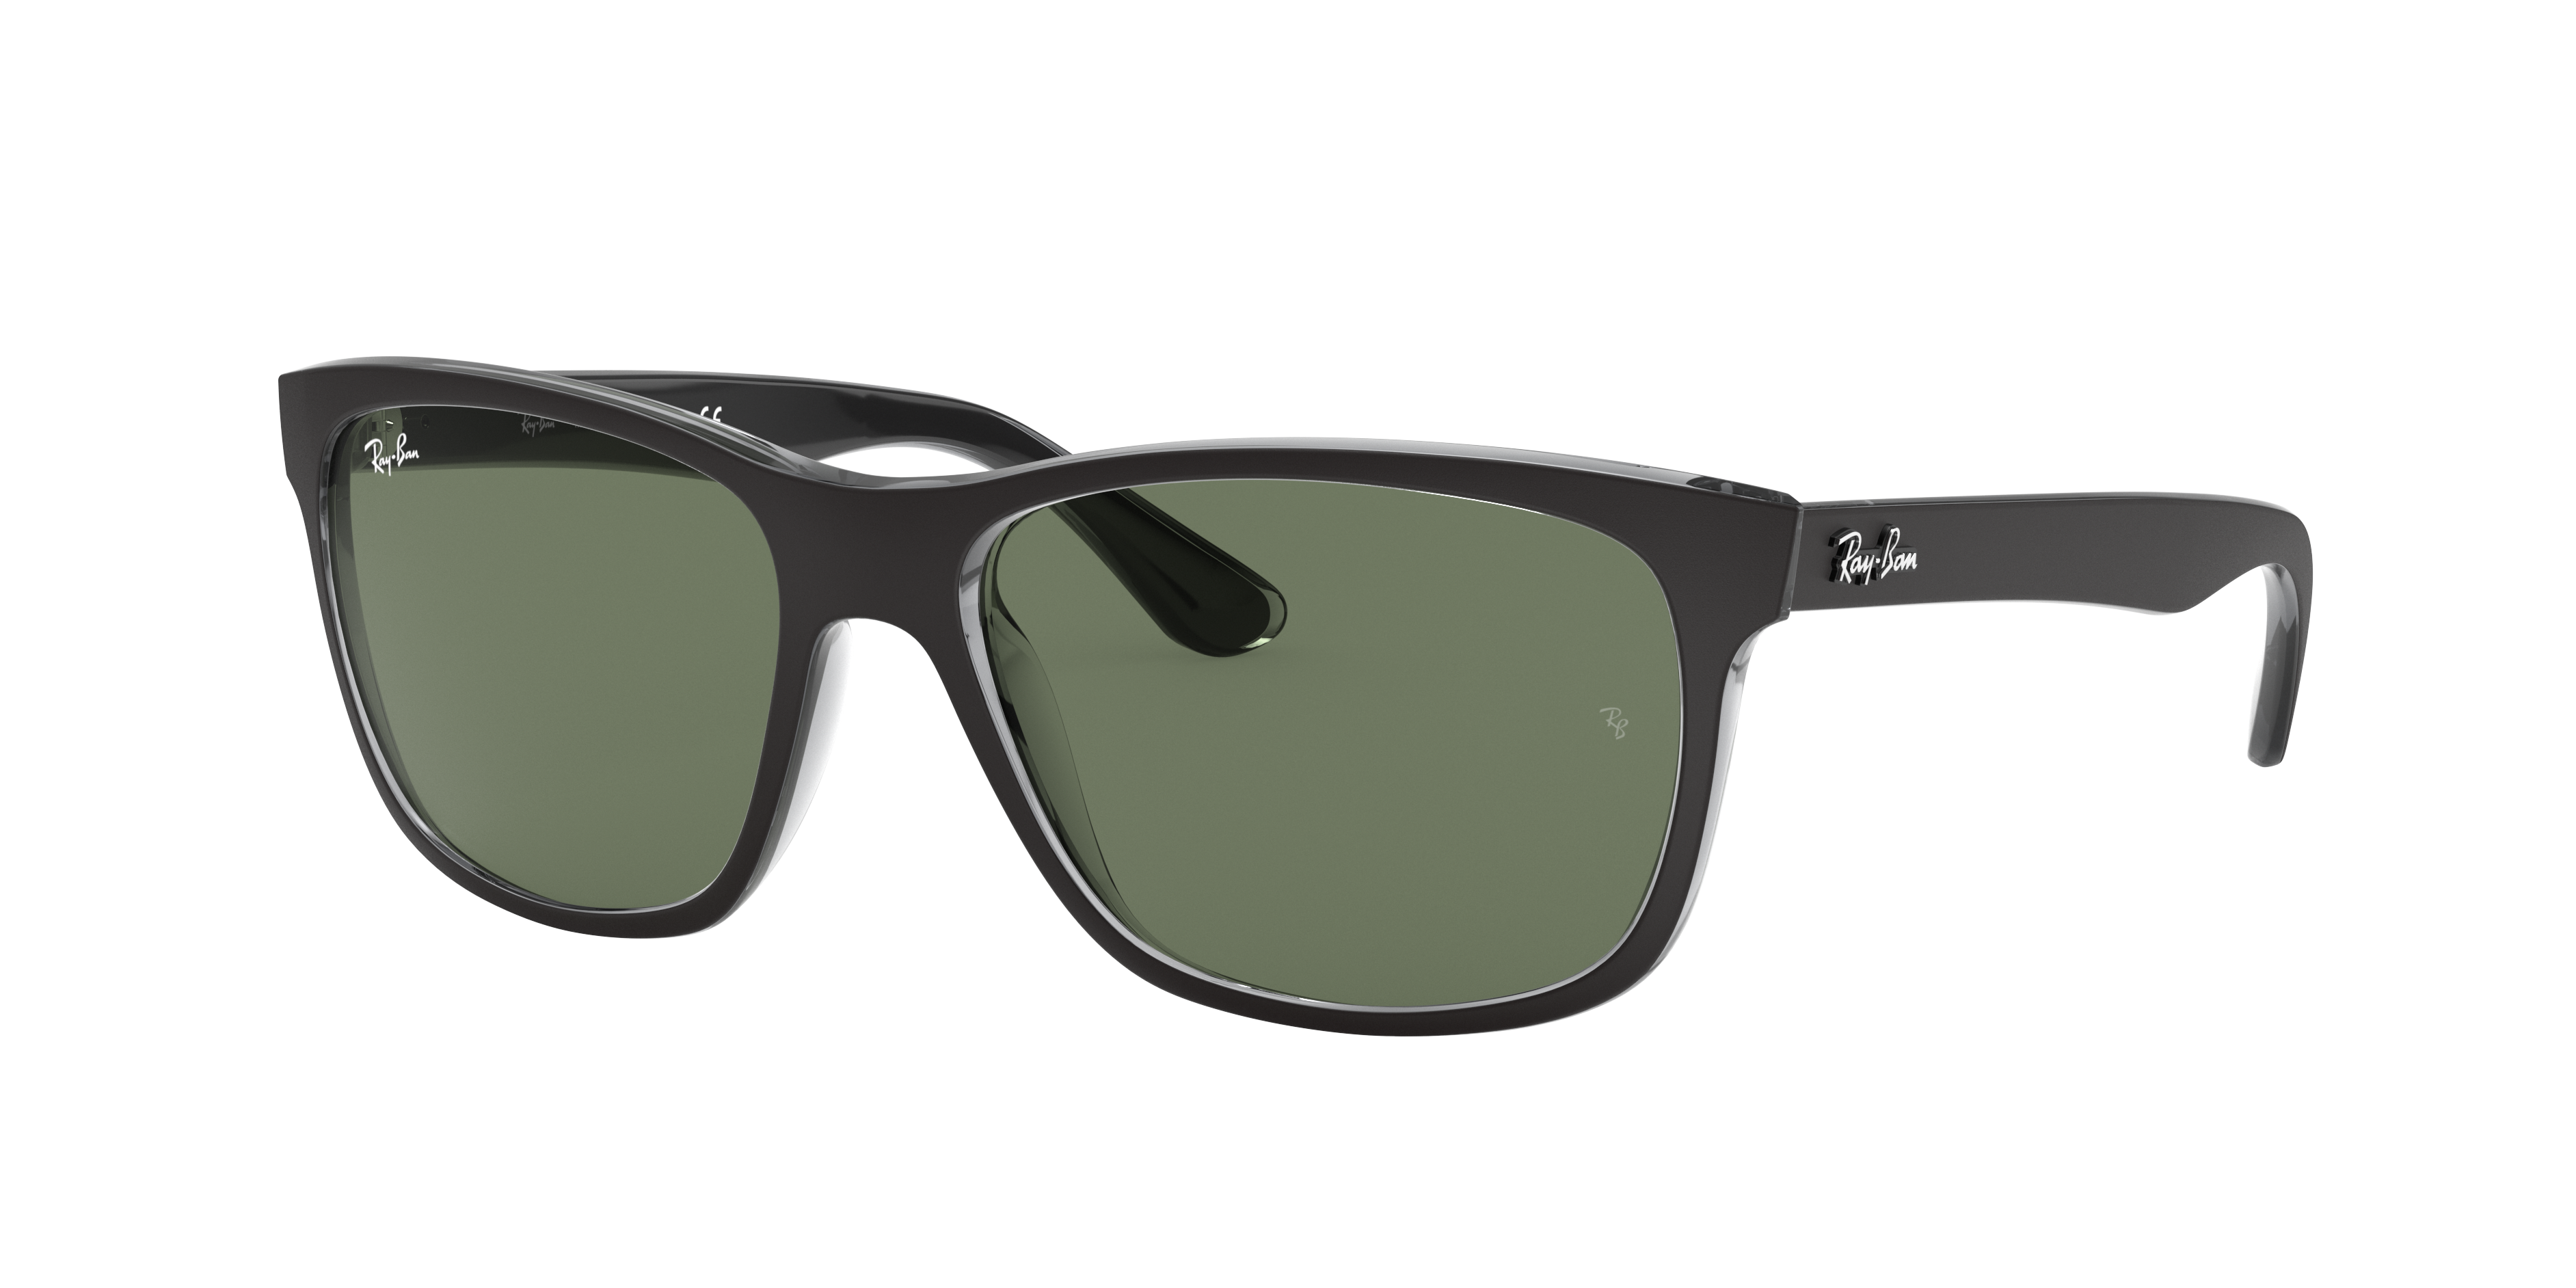 Ray-Ban Rb4181 Black, Green Lenses - RB4181